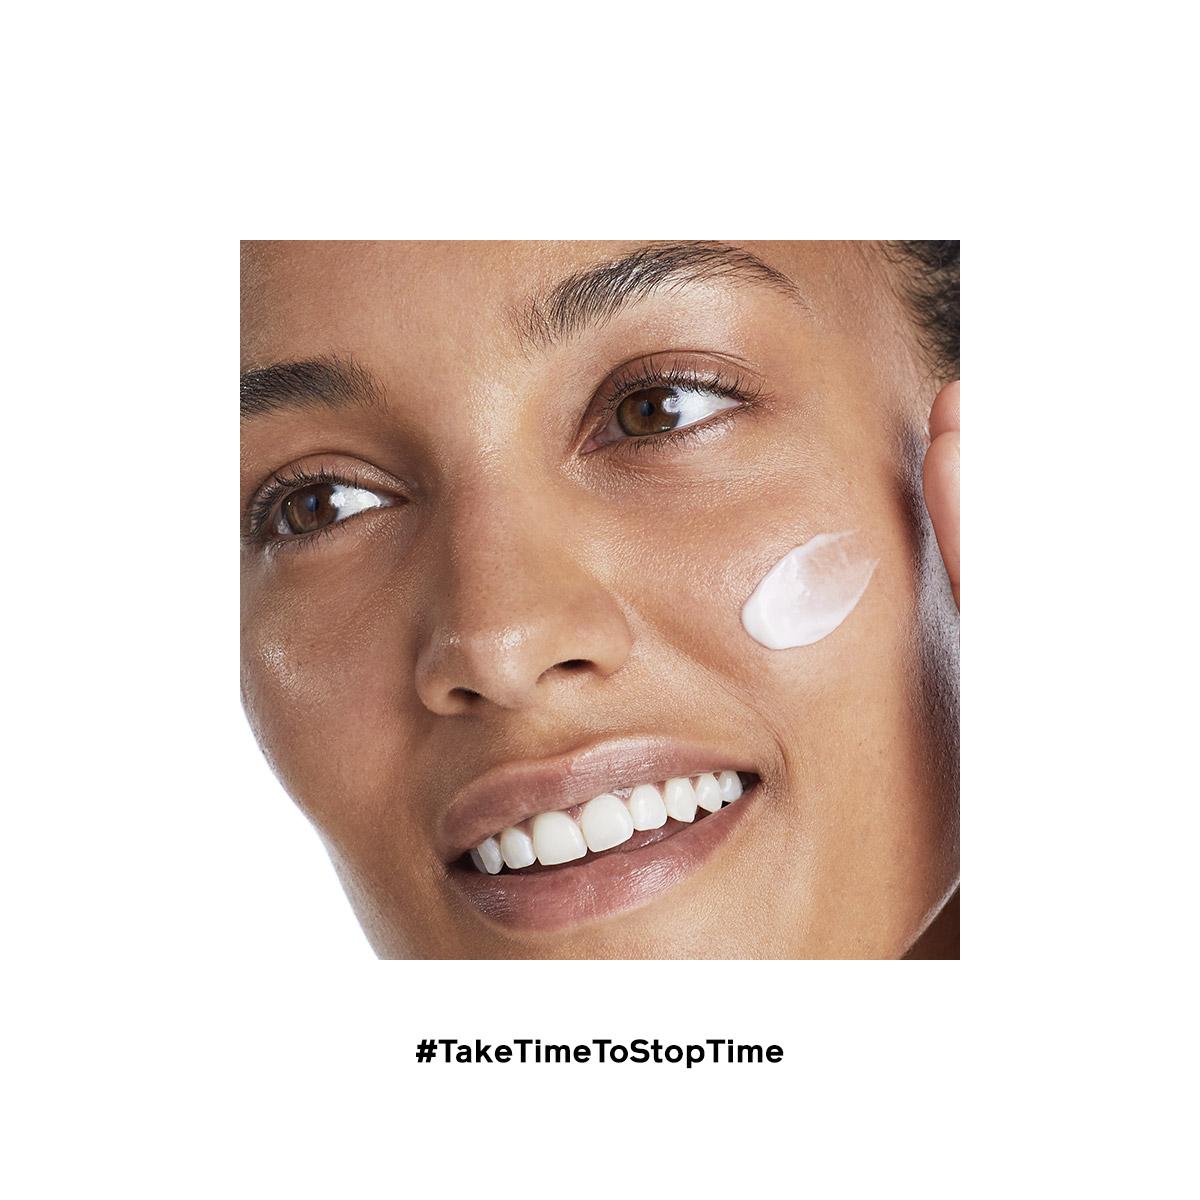 Week_3_20160130_Shiseido_Shot_20_GlowMoisturizing_Closeup_1202_Facebook_1200x1200 2.jpg